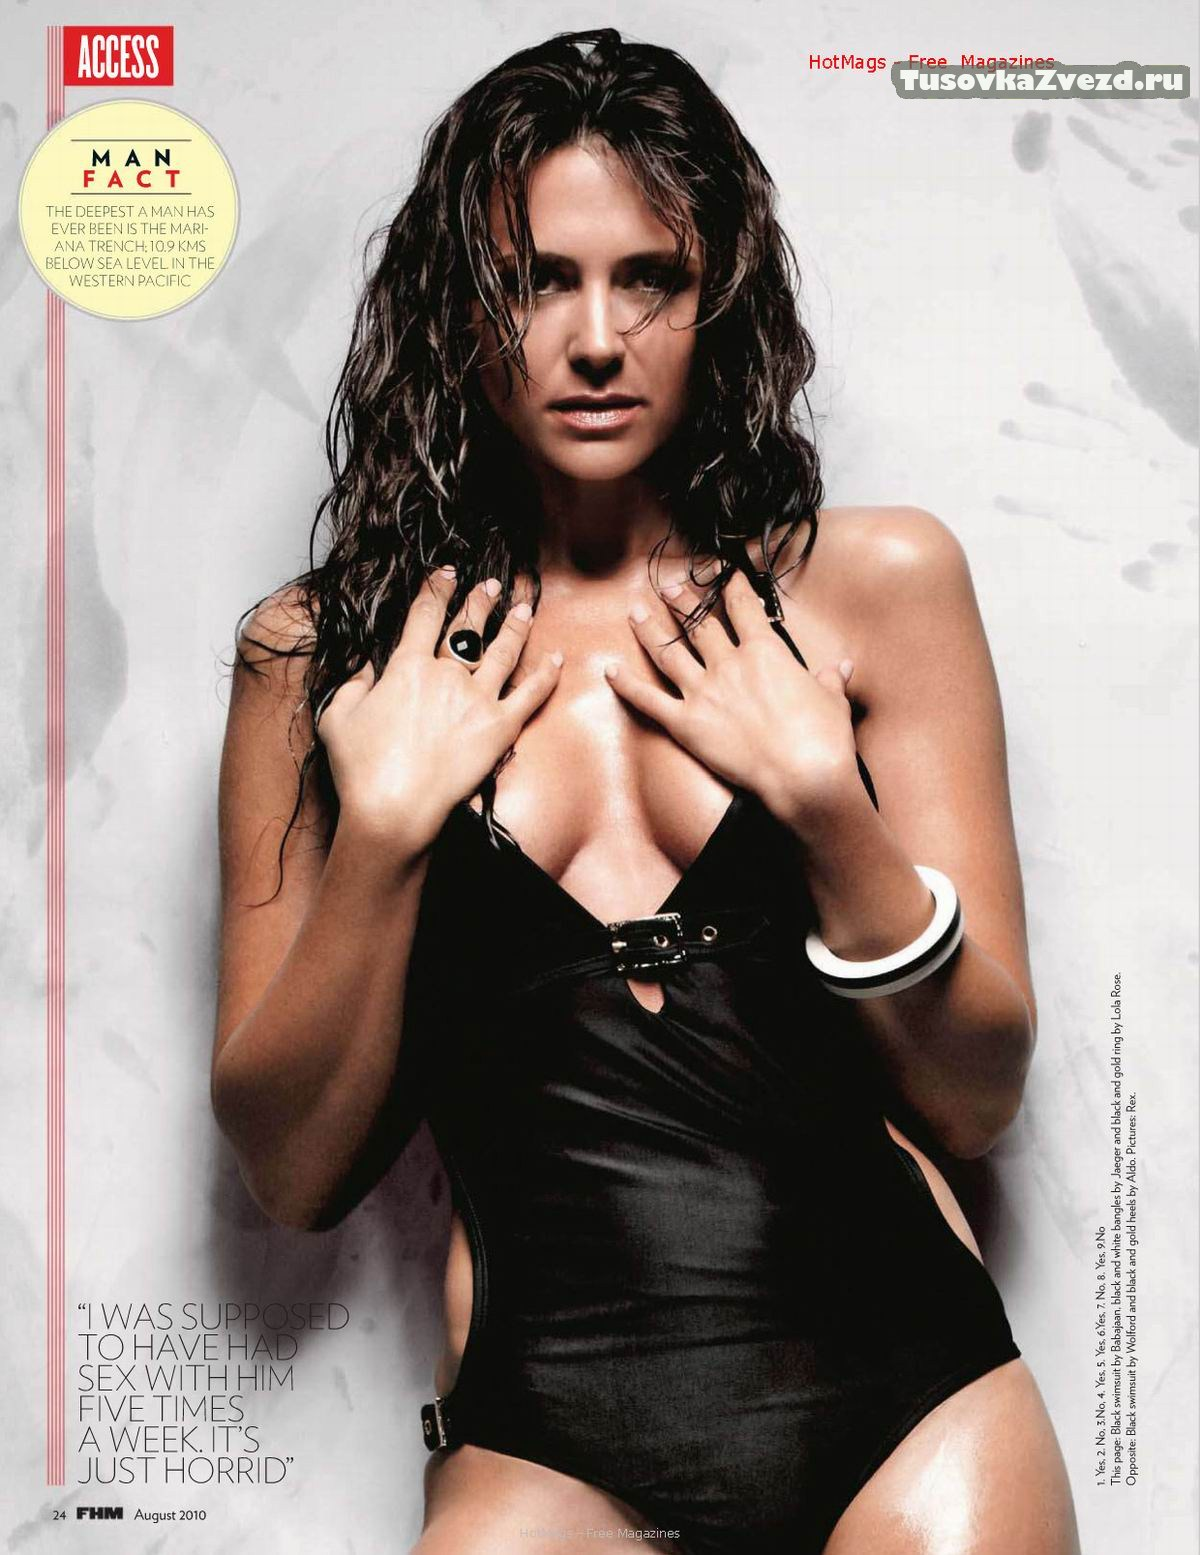 Ванесса Перронсел (Vanessa Perroncel) фото в журнале FHM Индия, август 2010